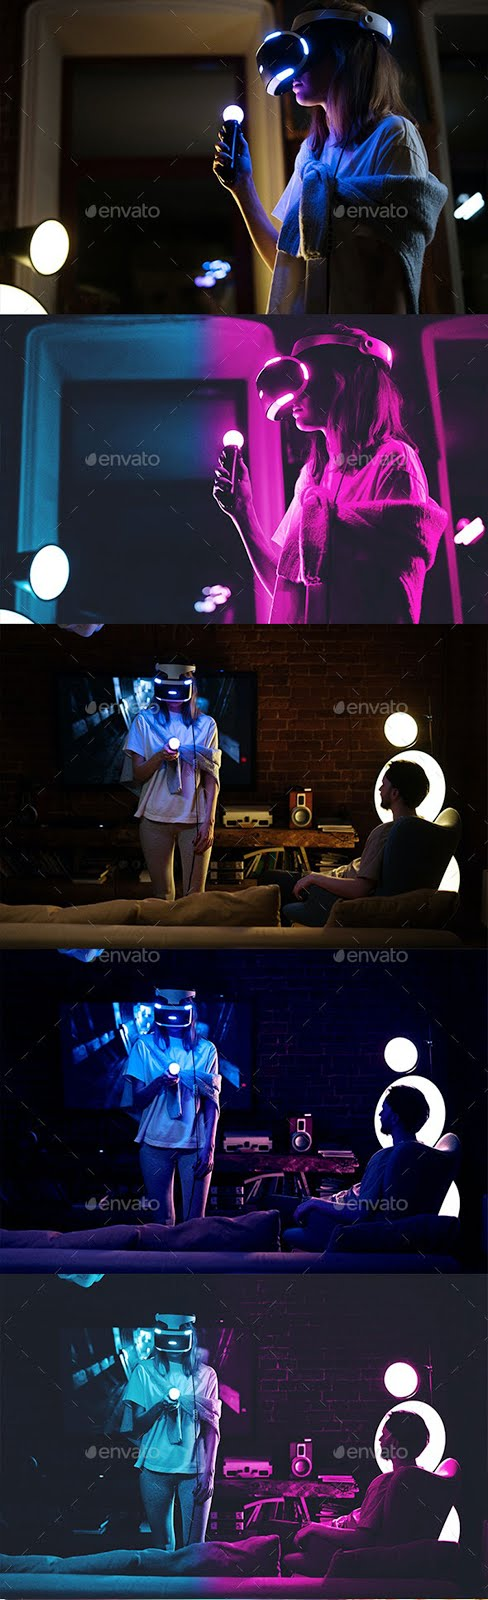 Cyberpunk Photoshop Template V2 27643757 Free Download